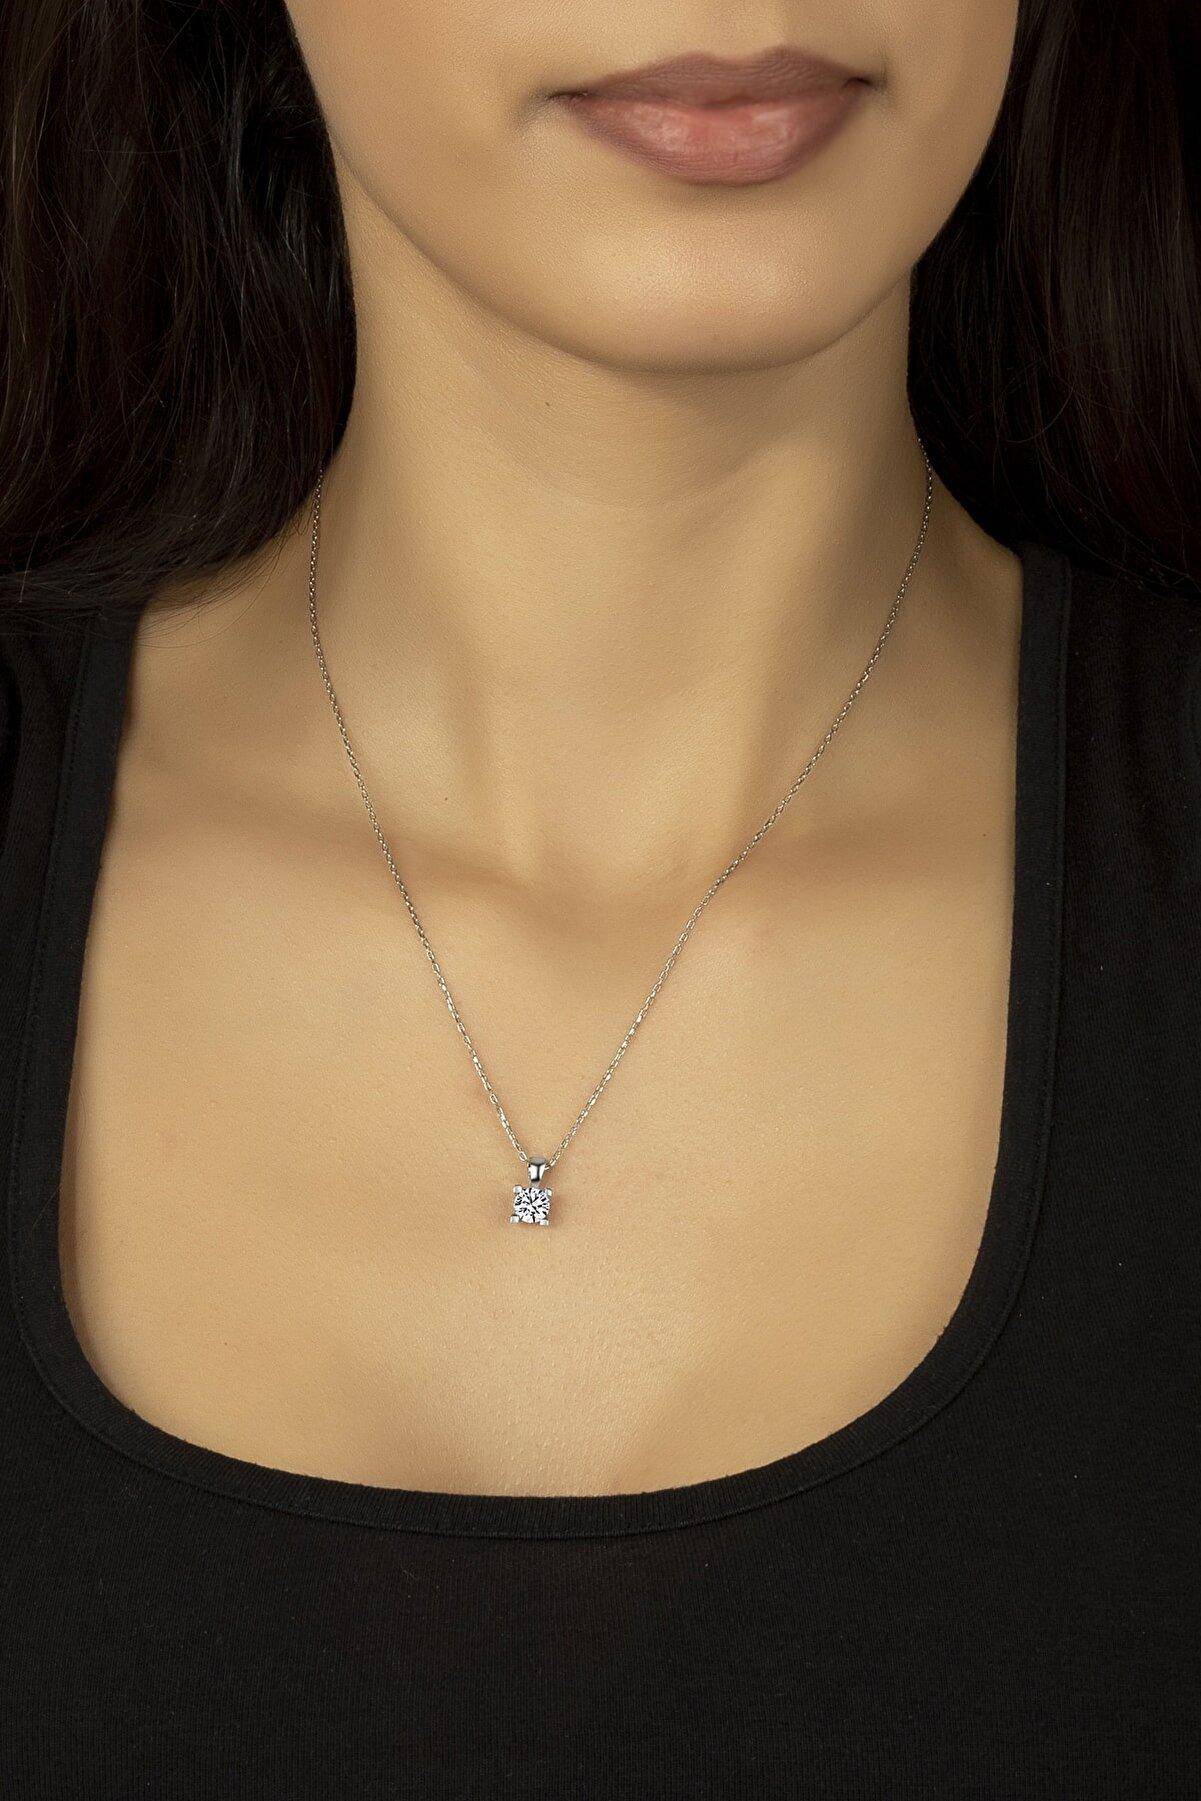 Kara Jewelry Gümüş Kolye Orijinal Swarovskı Taşlı Tektaş Kadın Kolye